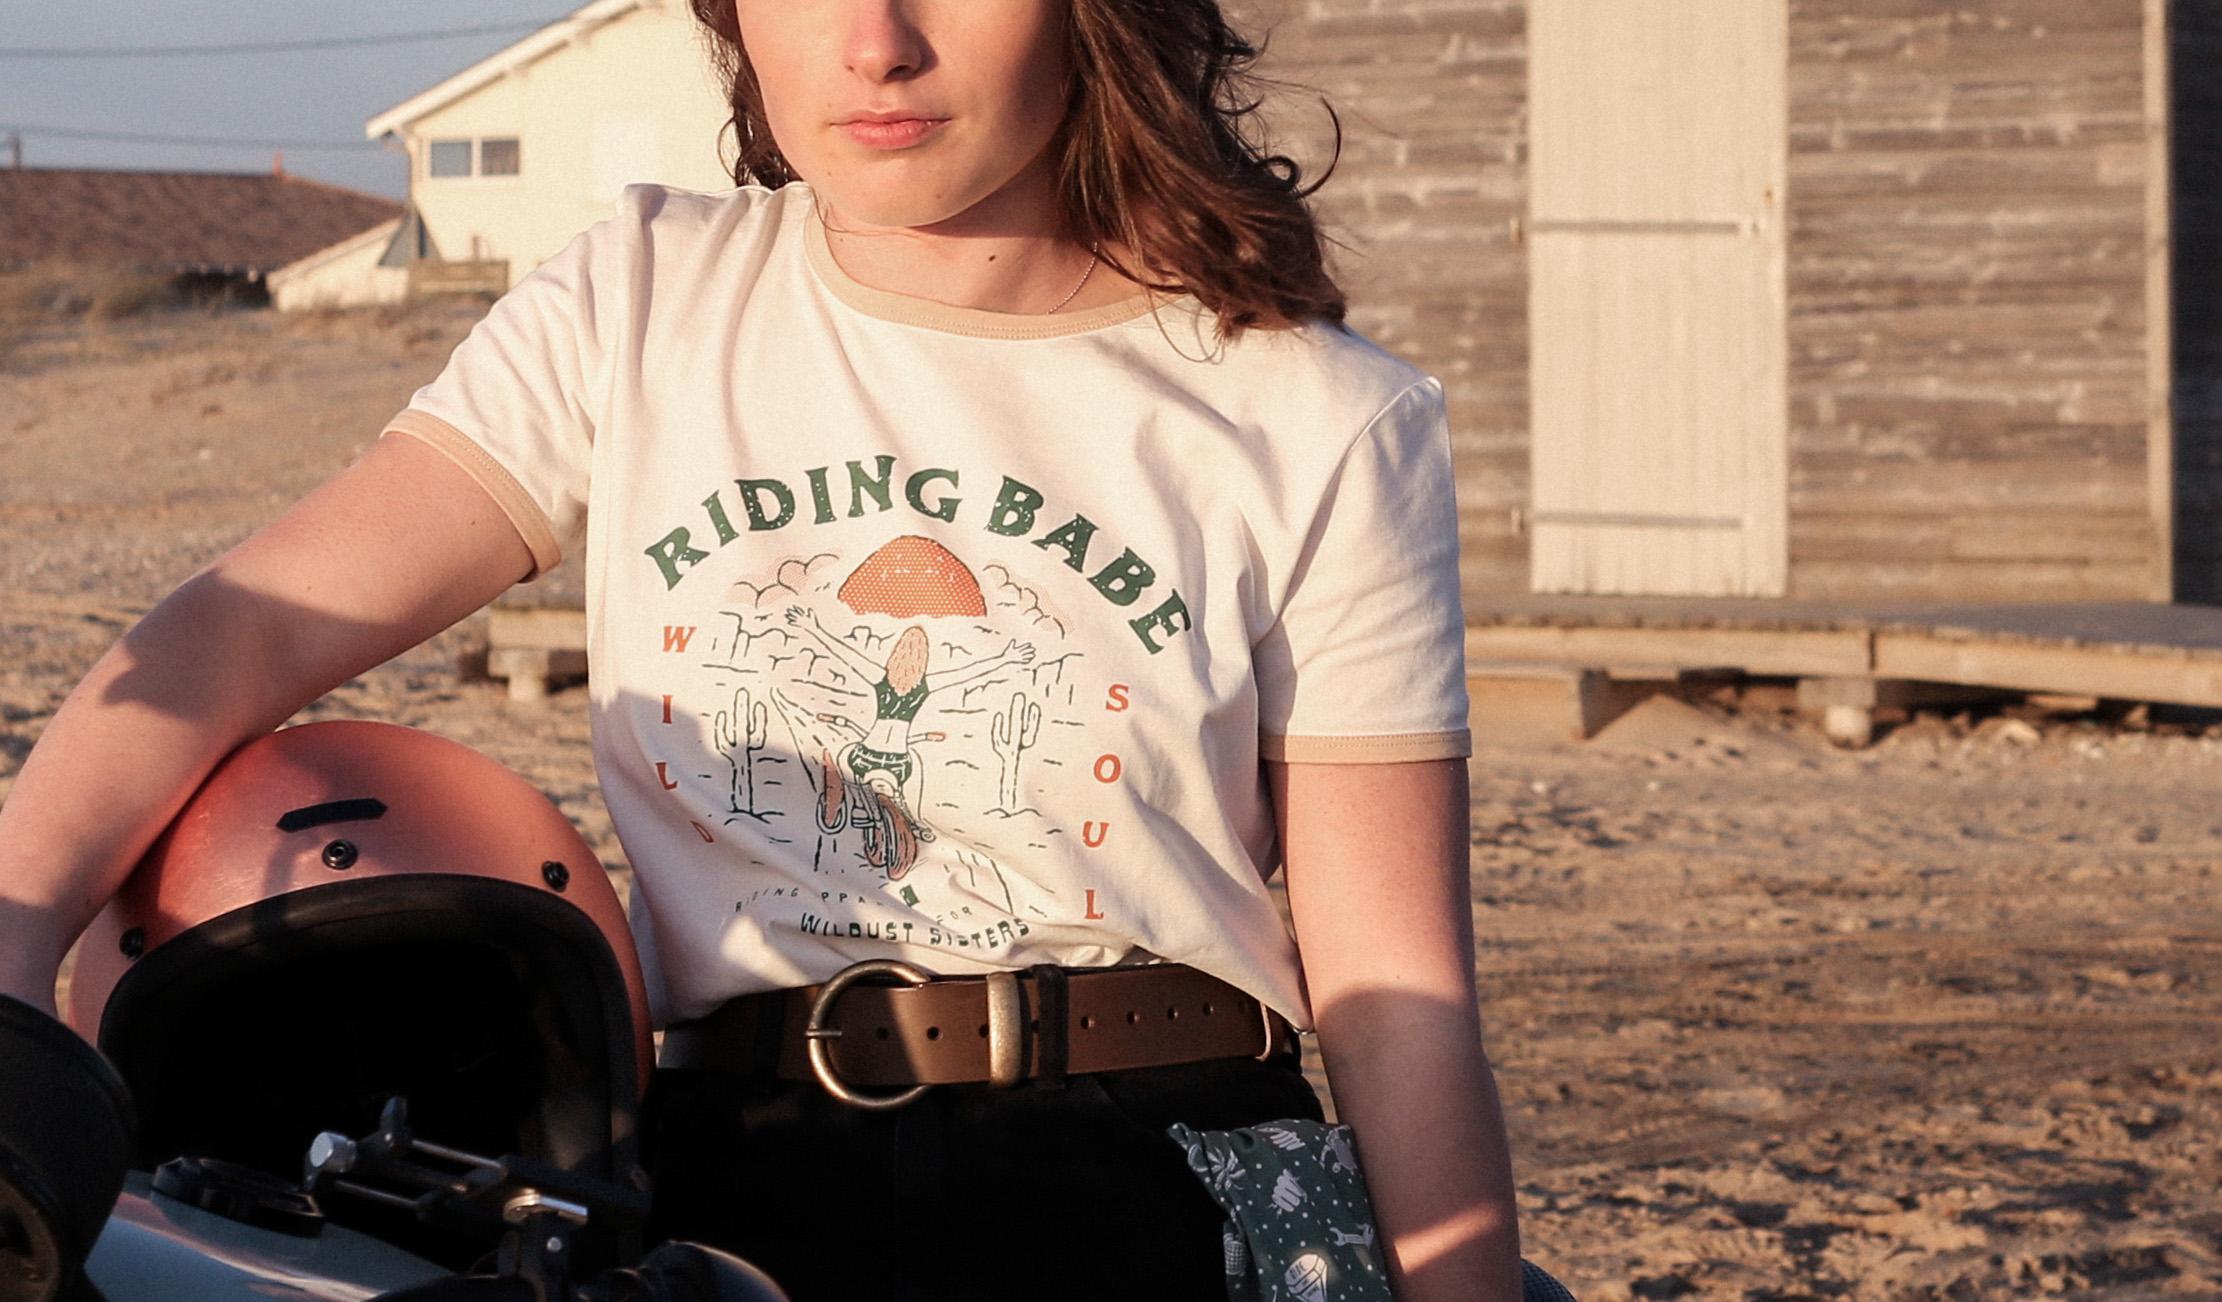 t shirt riding babe